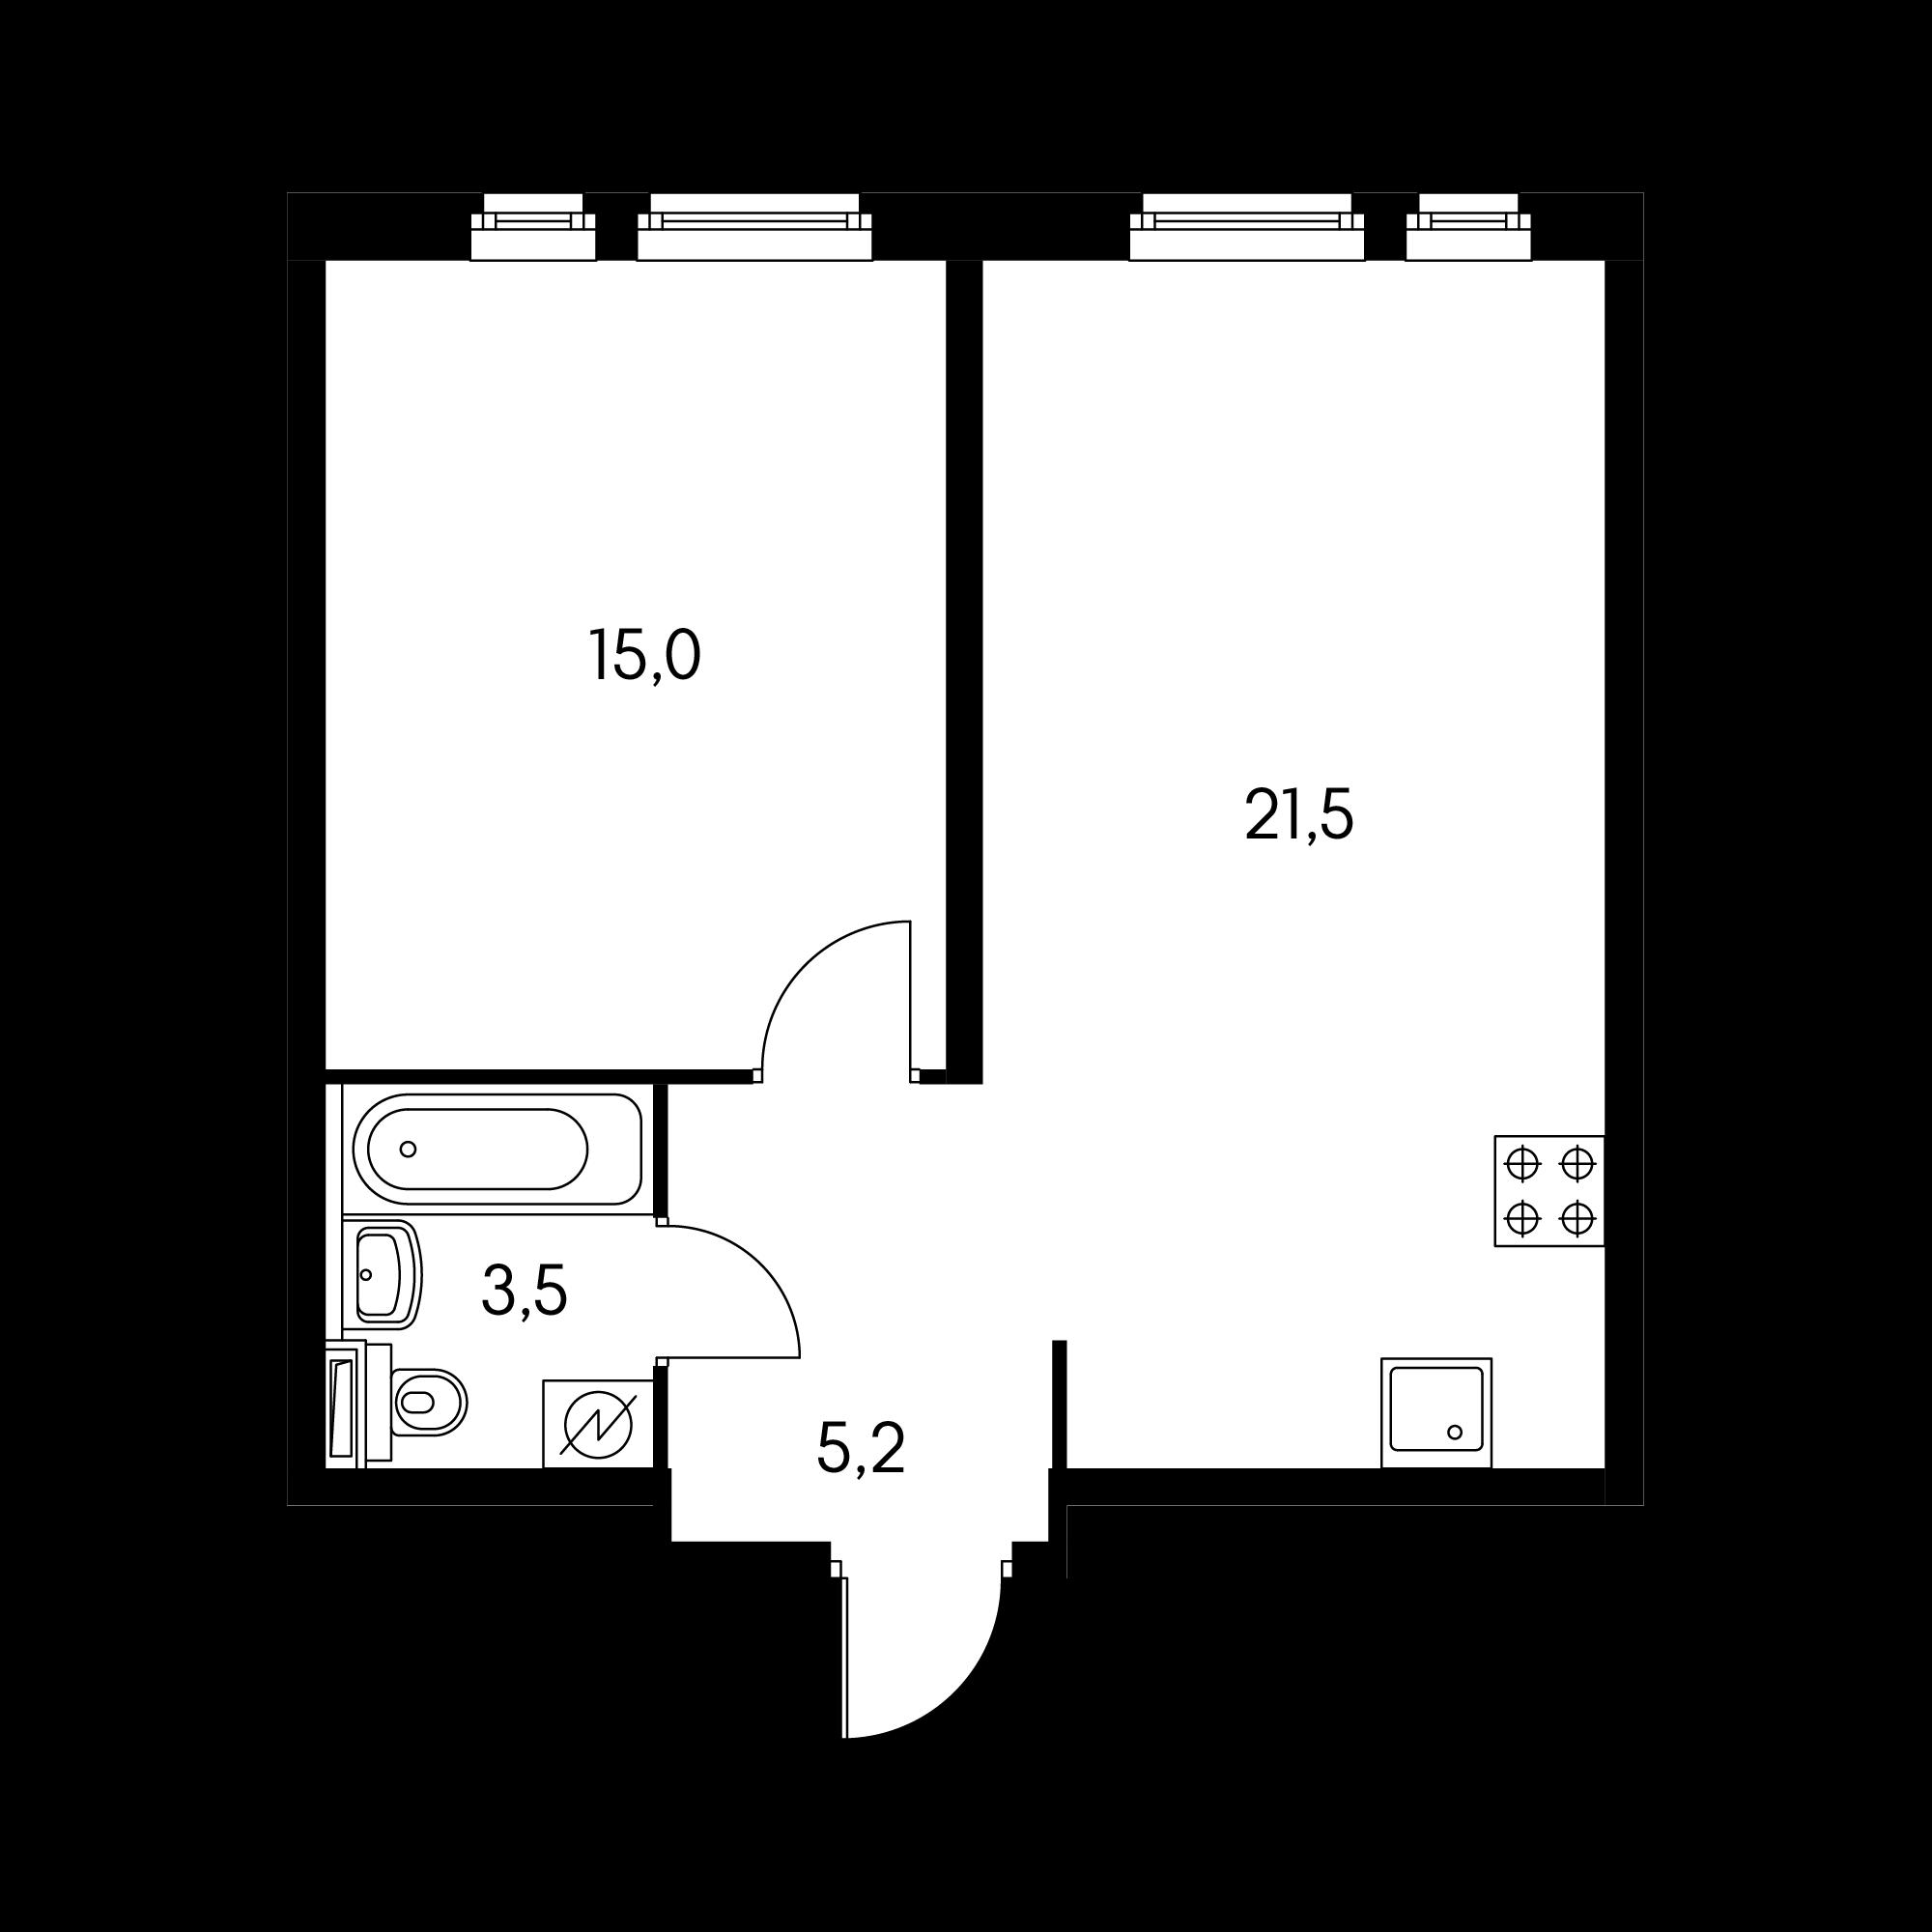 1EL1.10